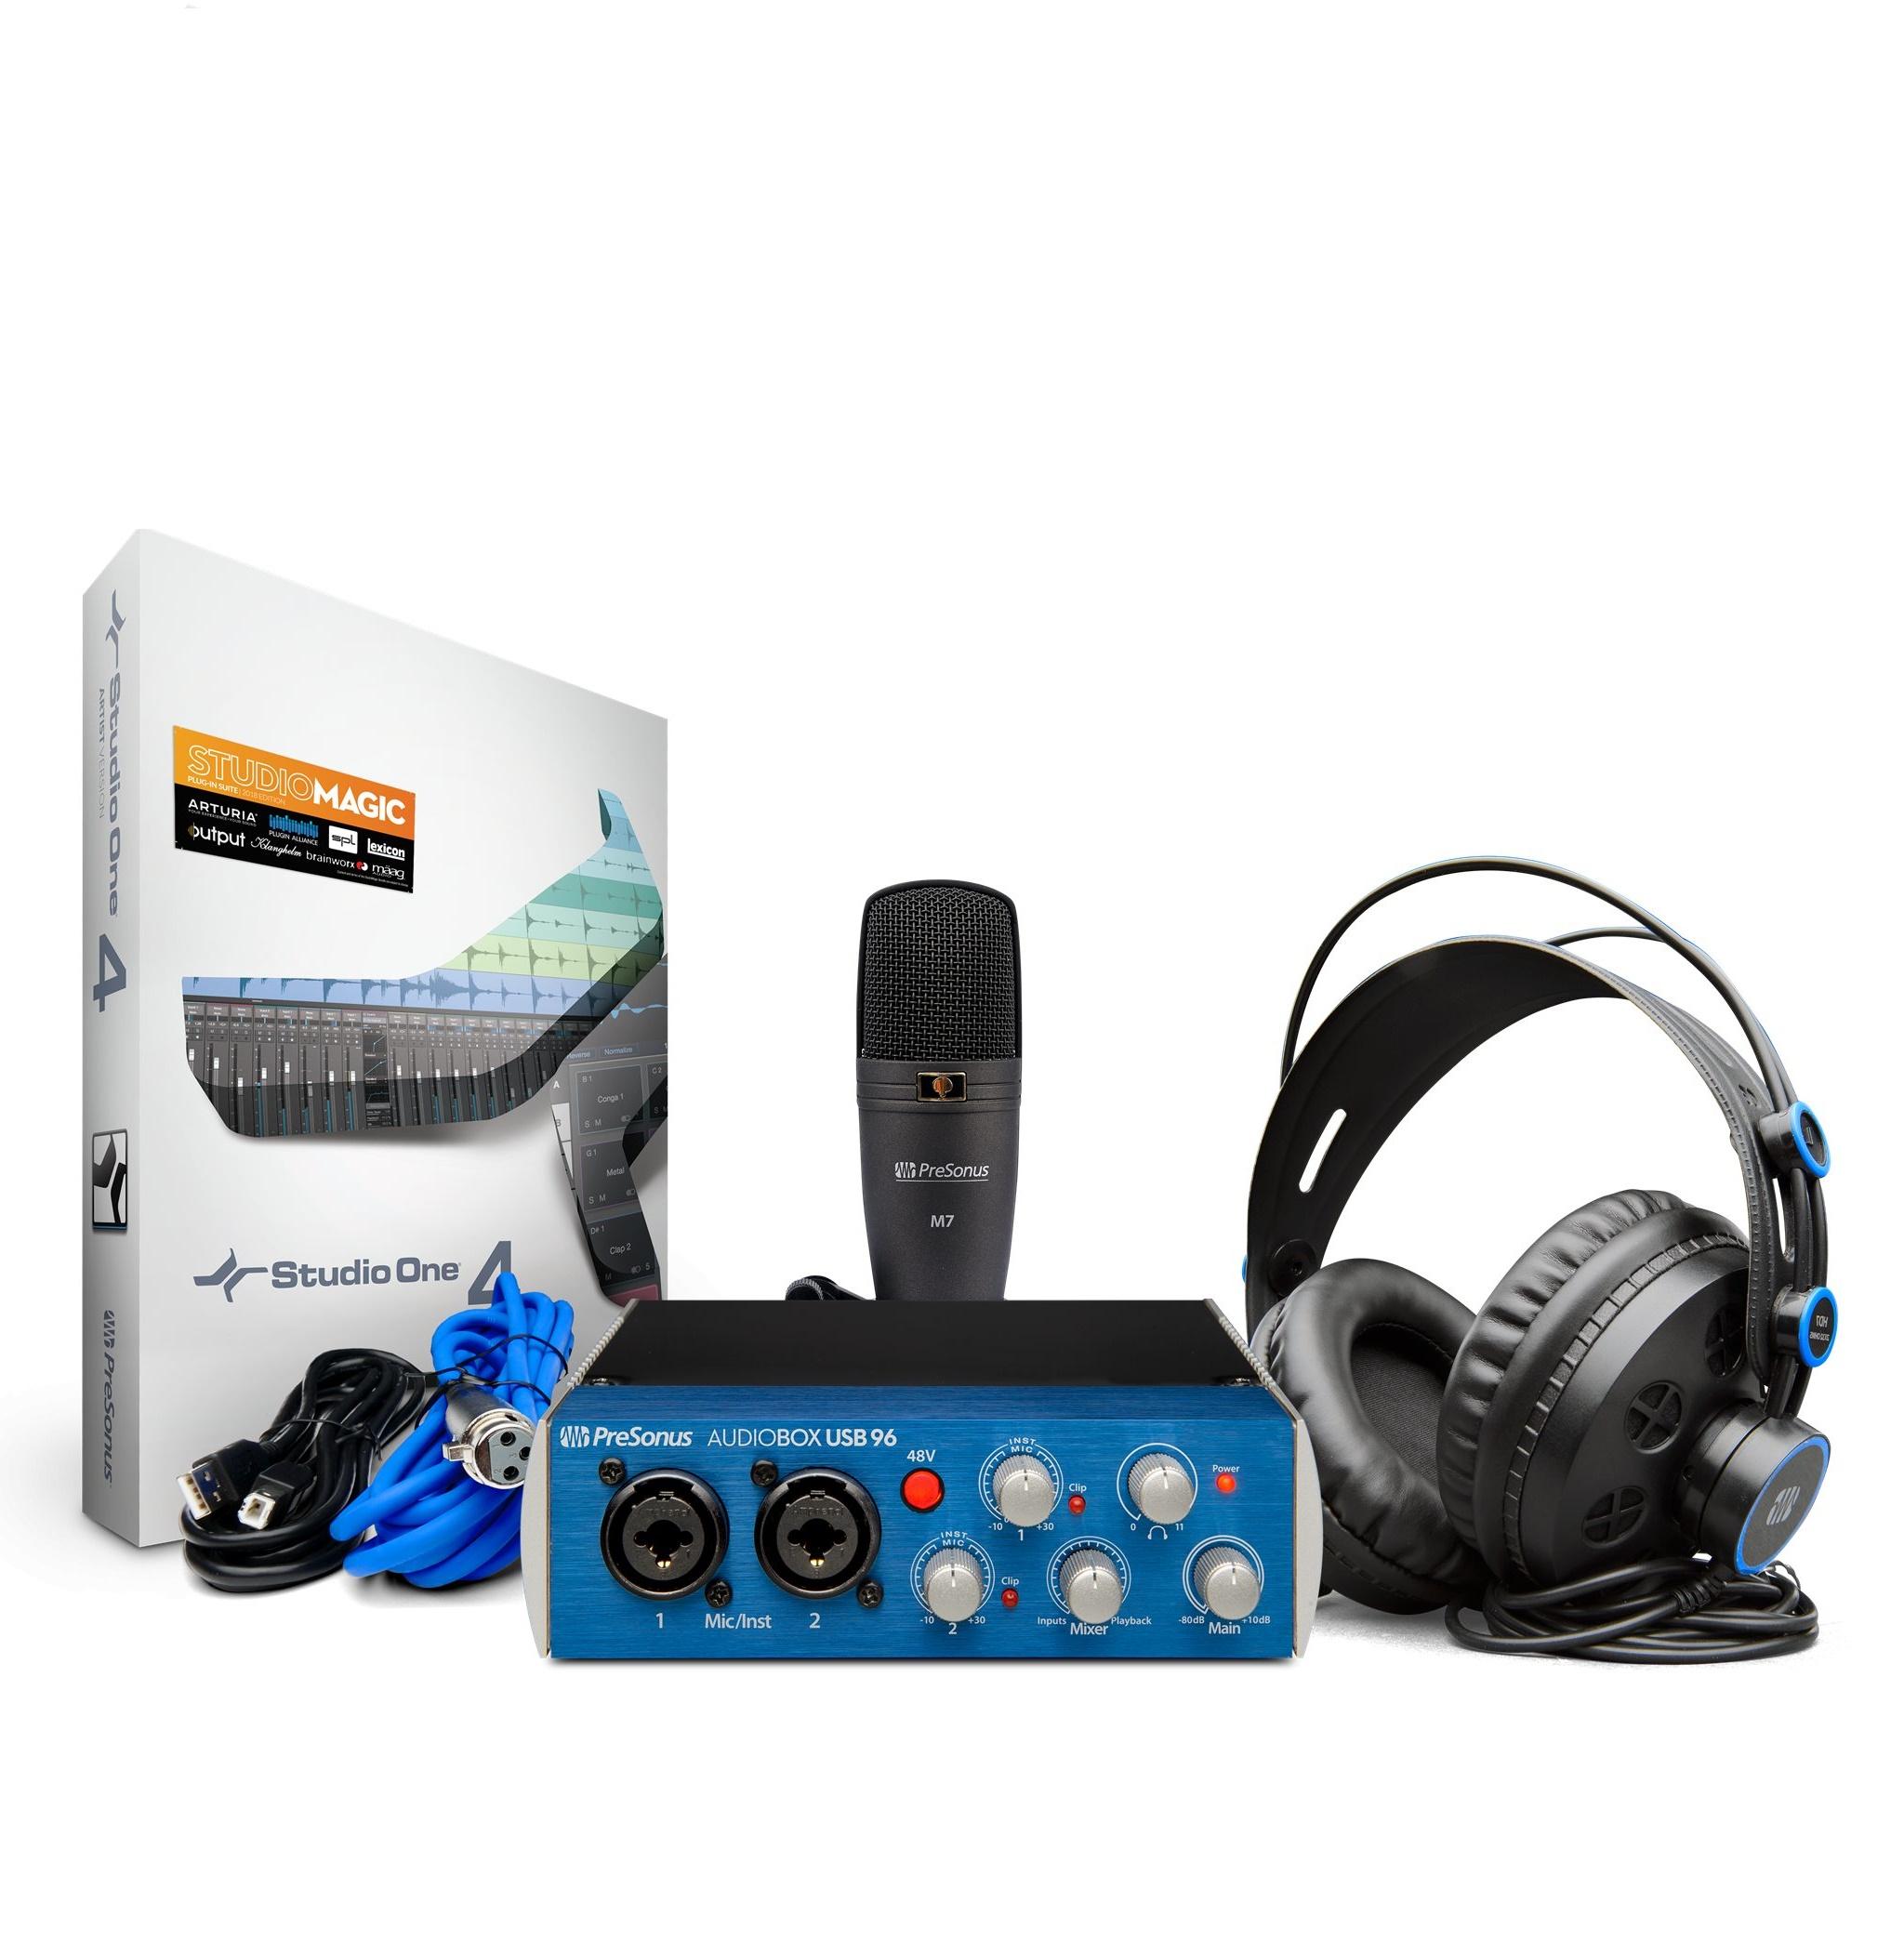 presonus-audiobox_96_studio_studioone4_big.jpg